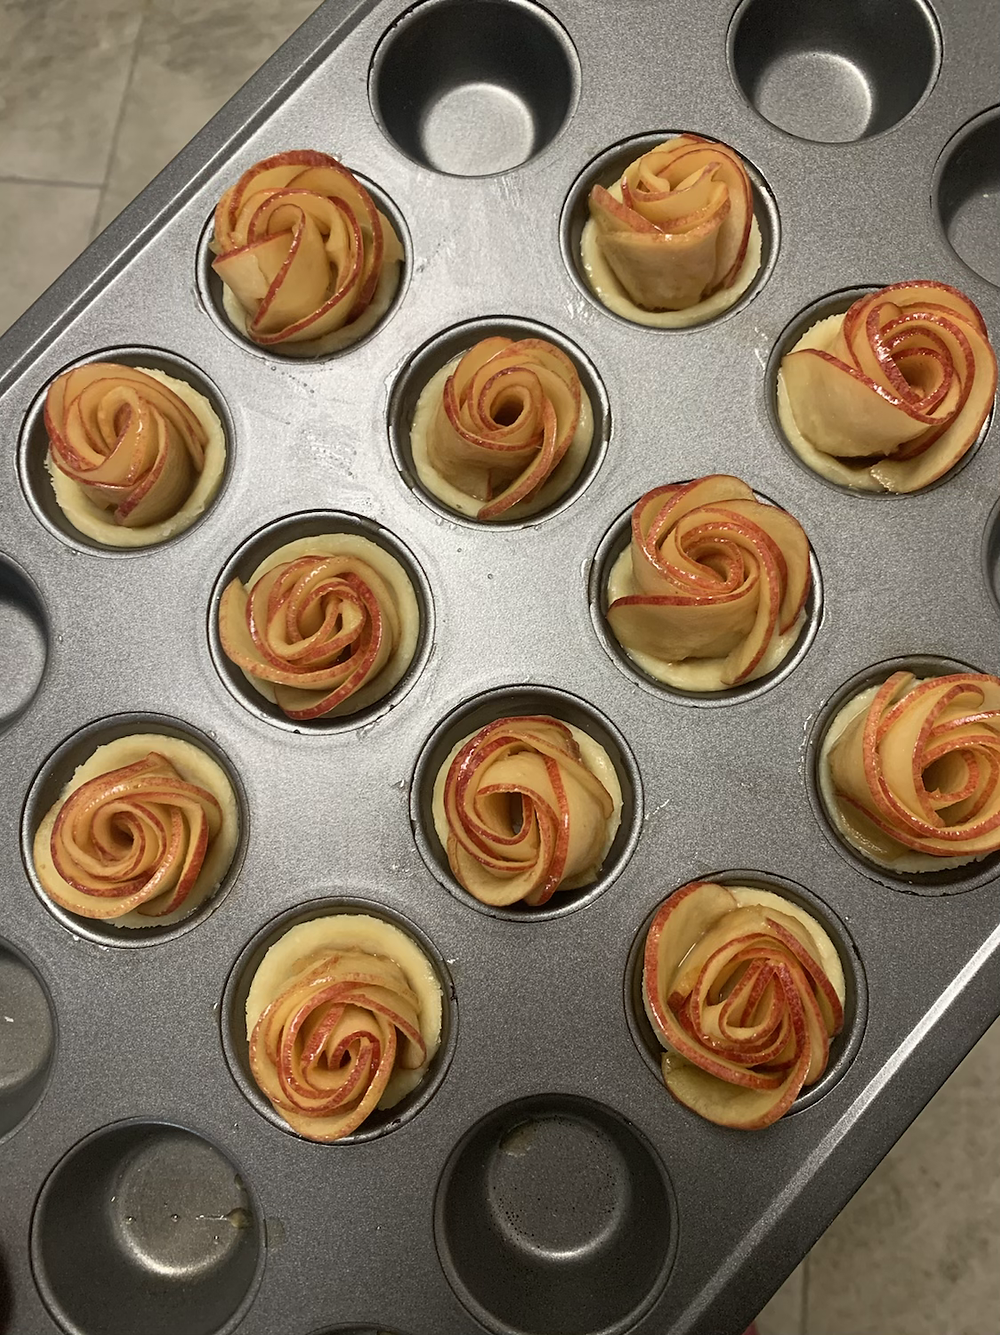 Mini Apple Pie Roses prior to baking